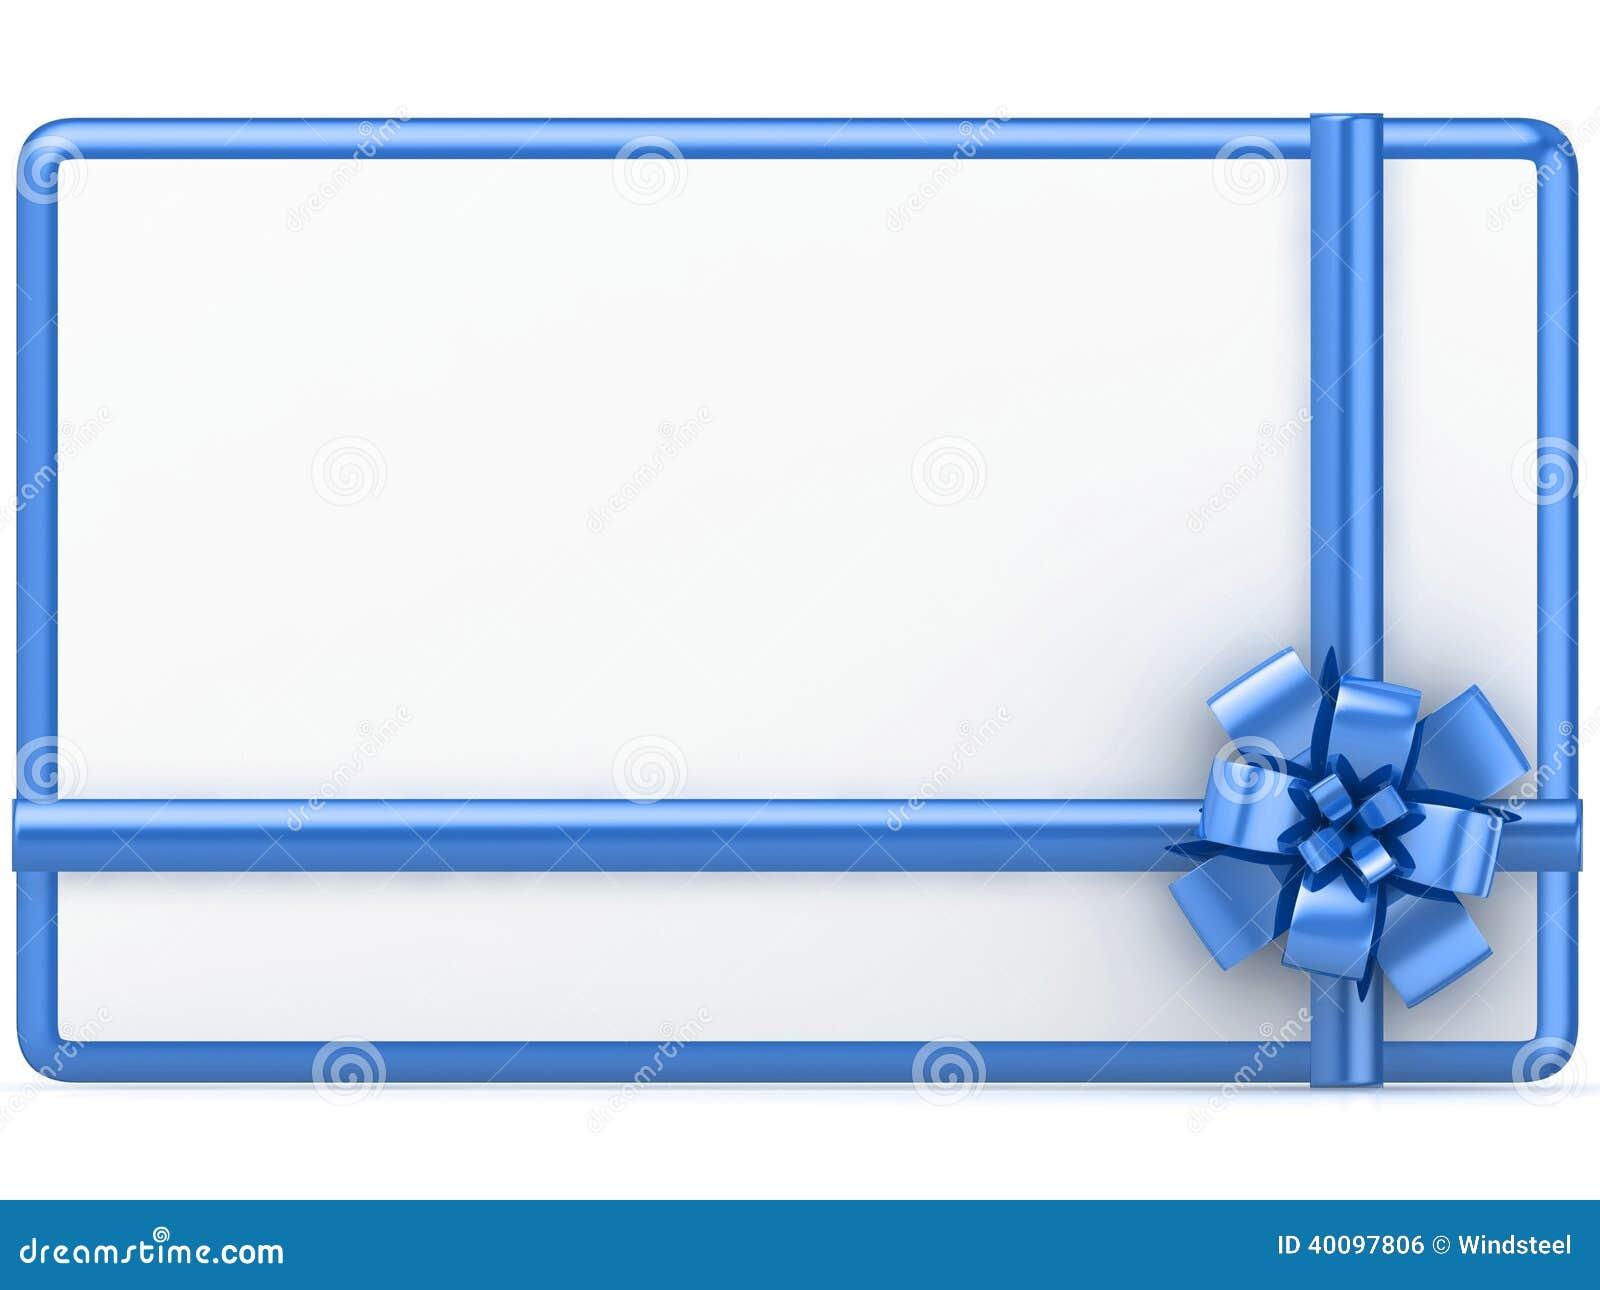 gift card on white background stock illustration